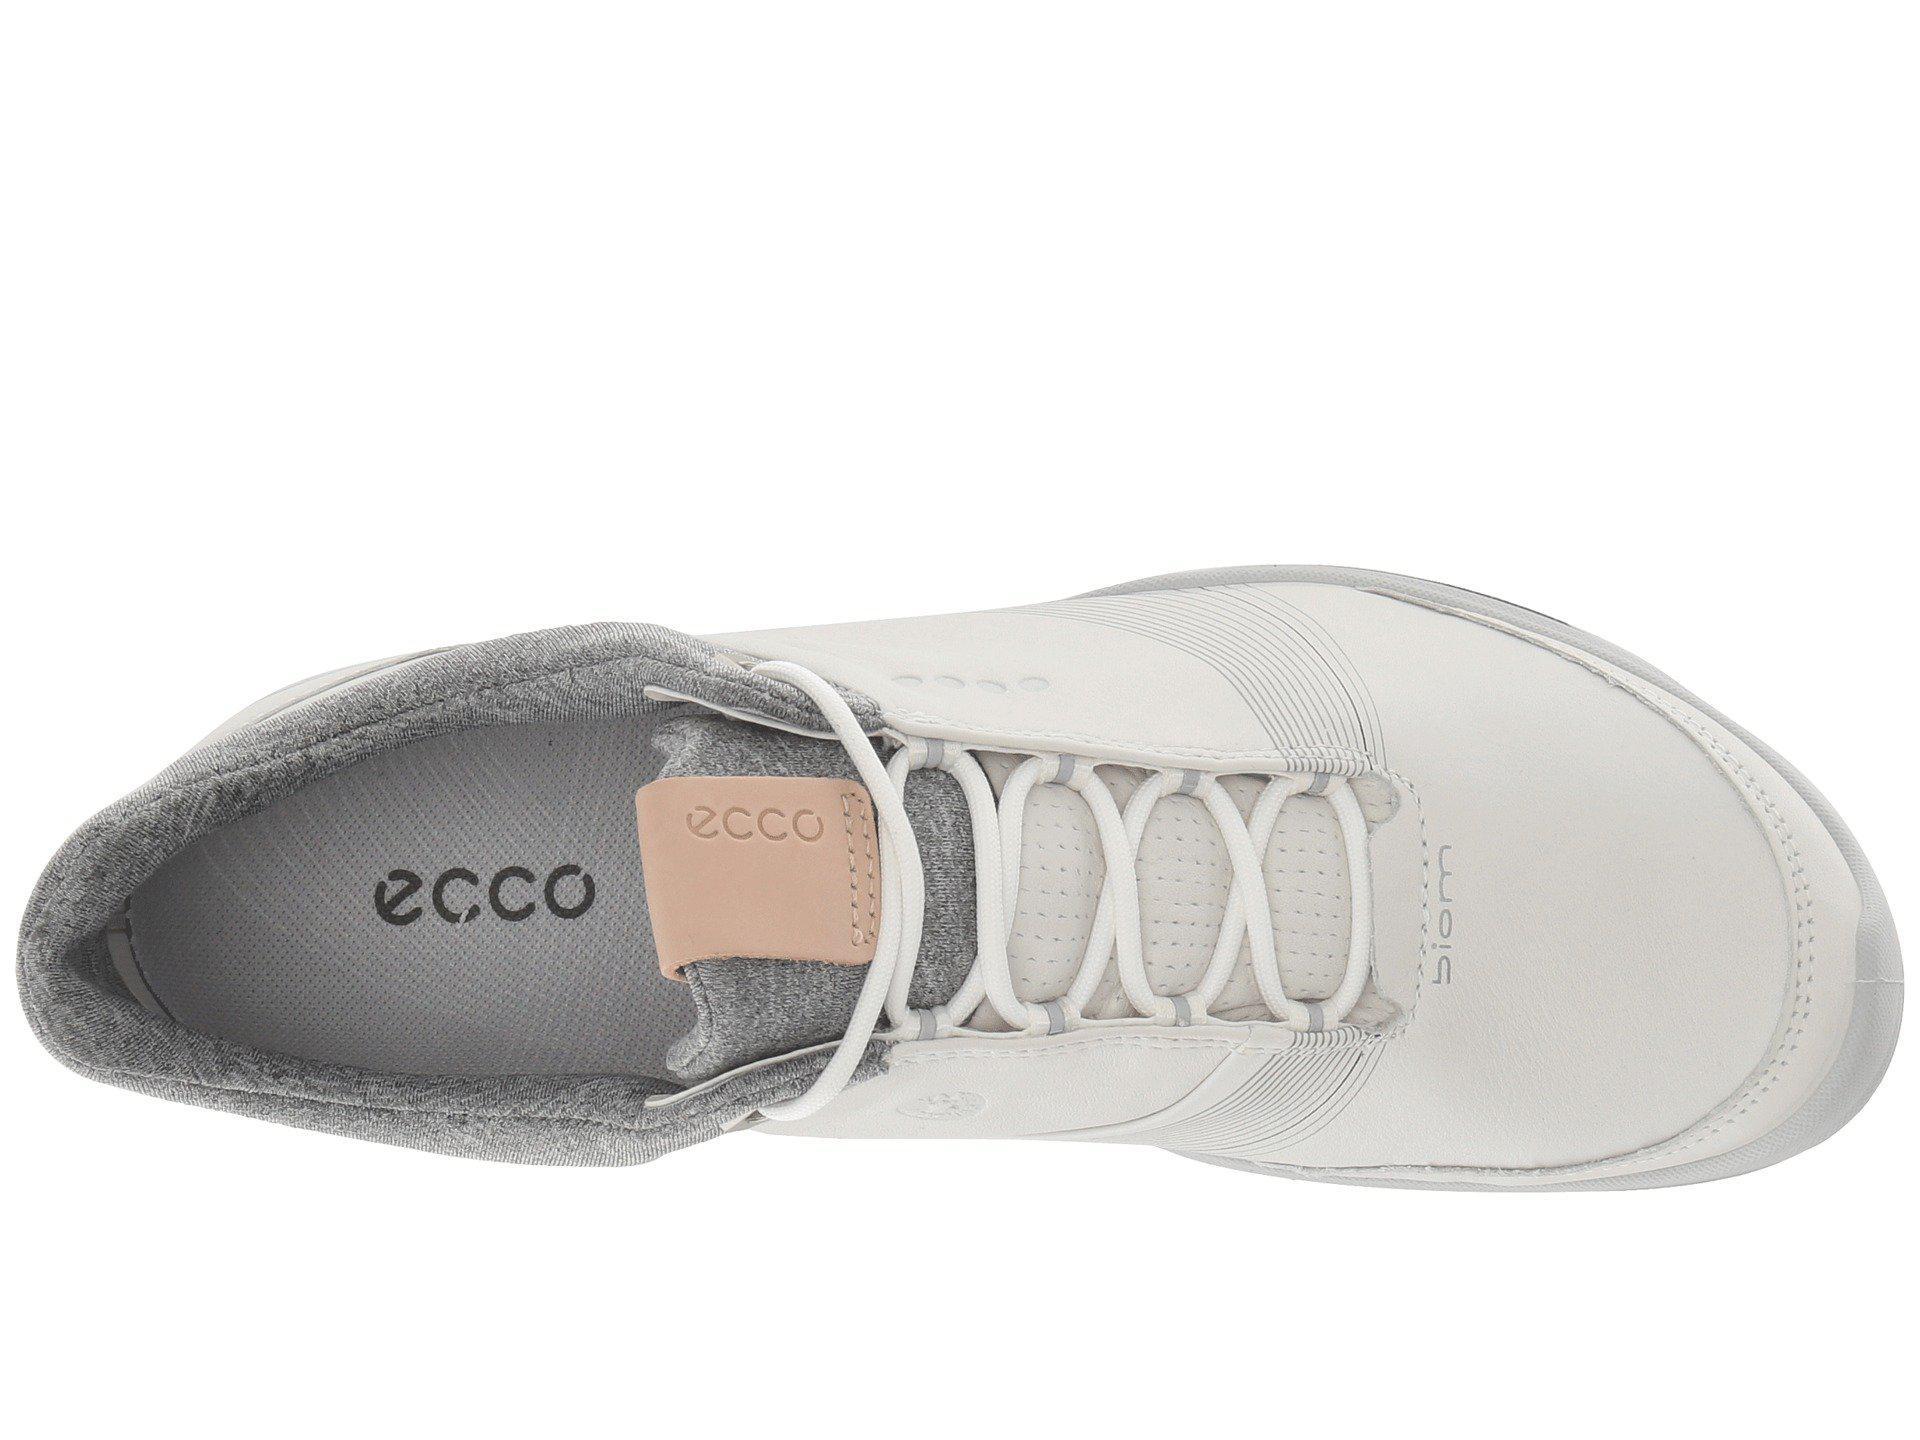 4d5085fd58b7 Lyst - Ecco Biom Hybrid 3 Gtx (white teaberry) Women s Golf Shoes in ...